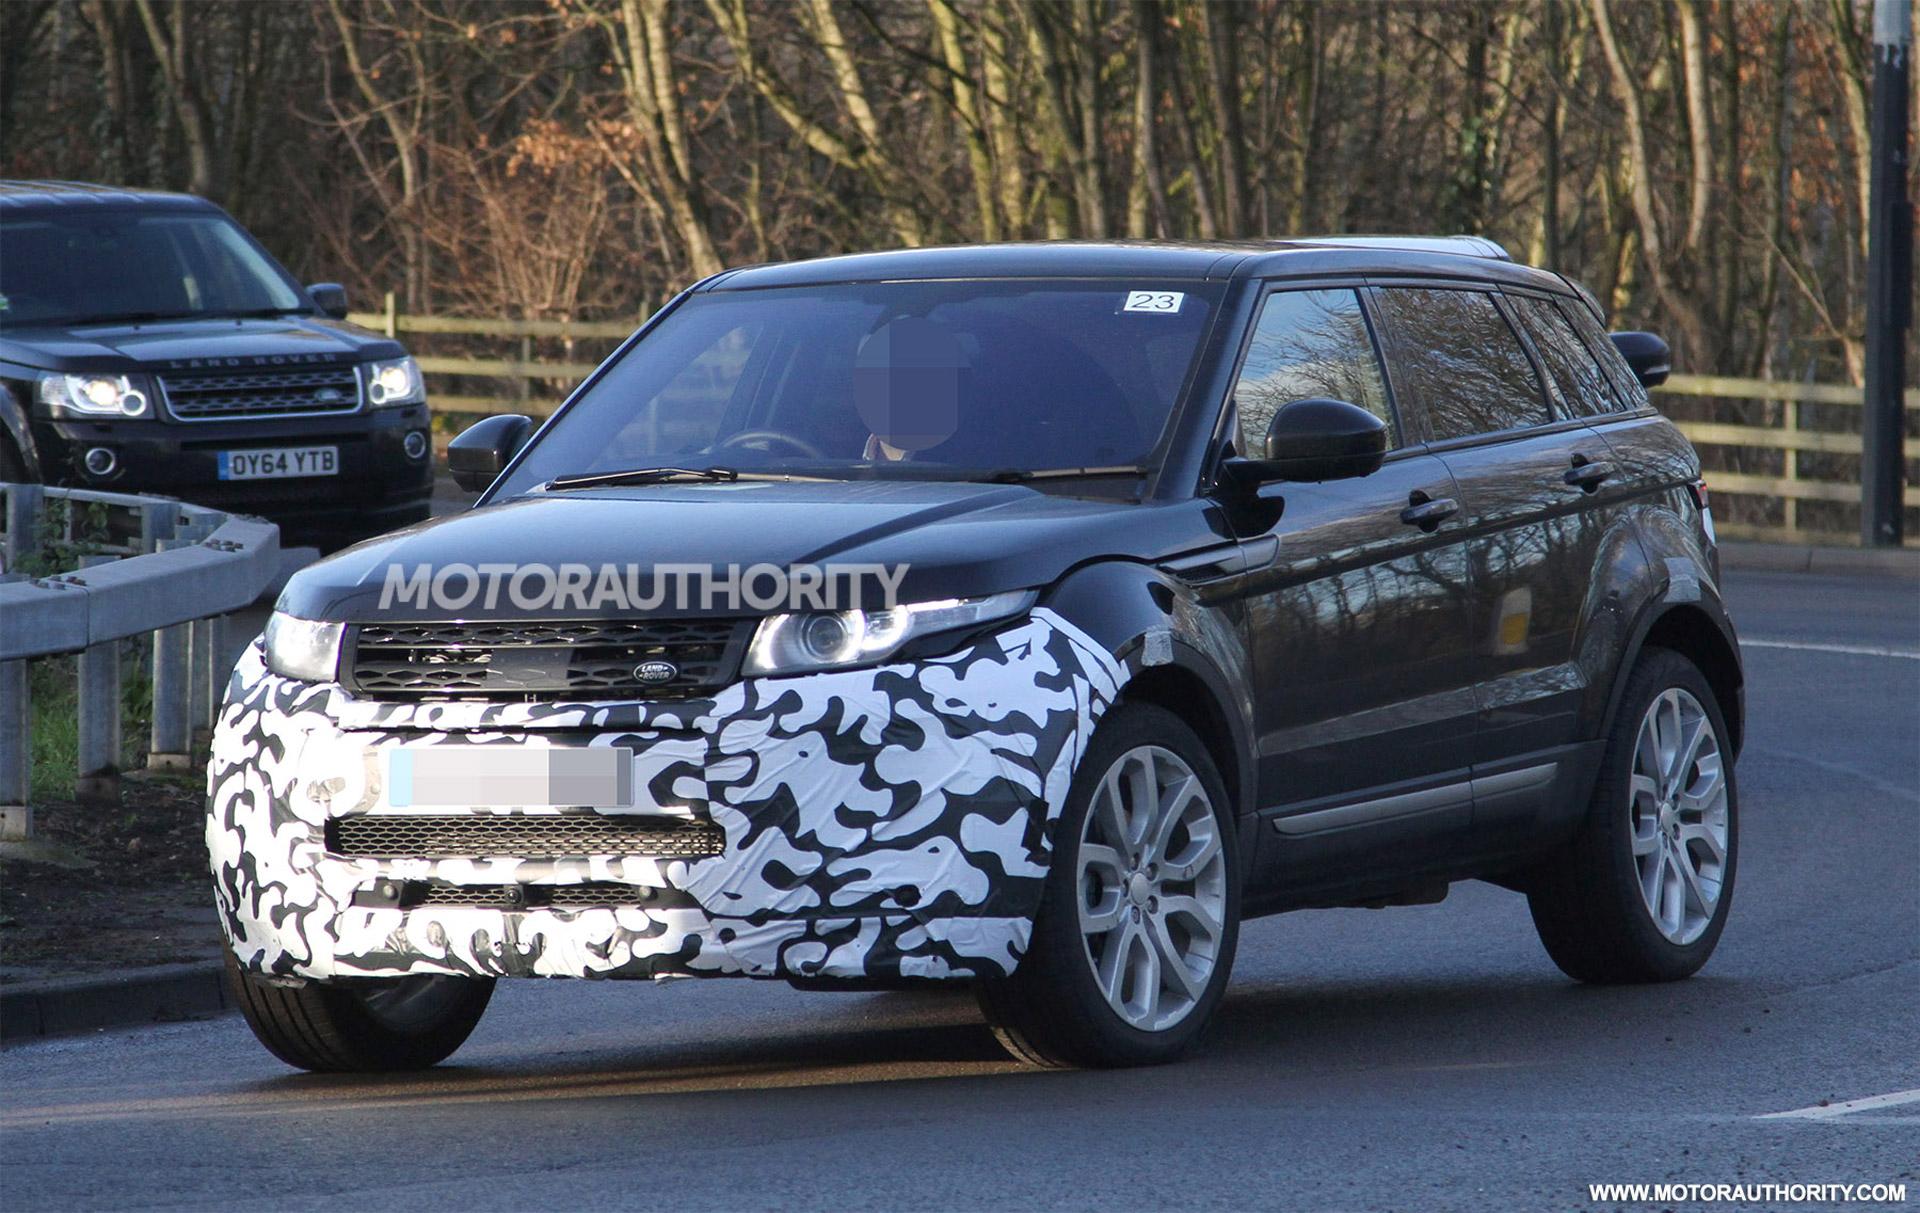 2016 Land Rover Range Rover Evoque Spy Shots